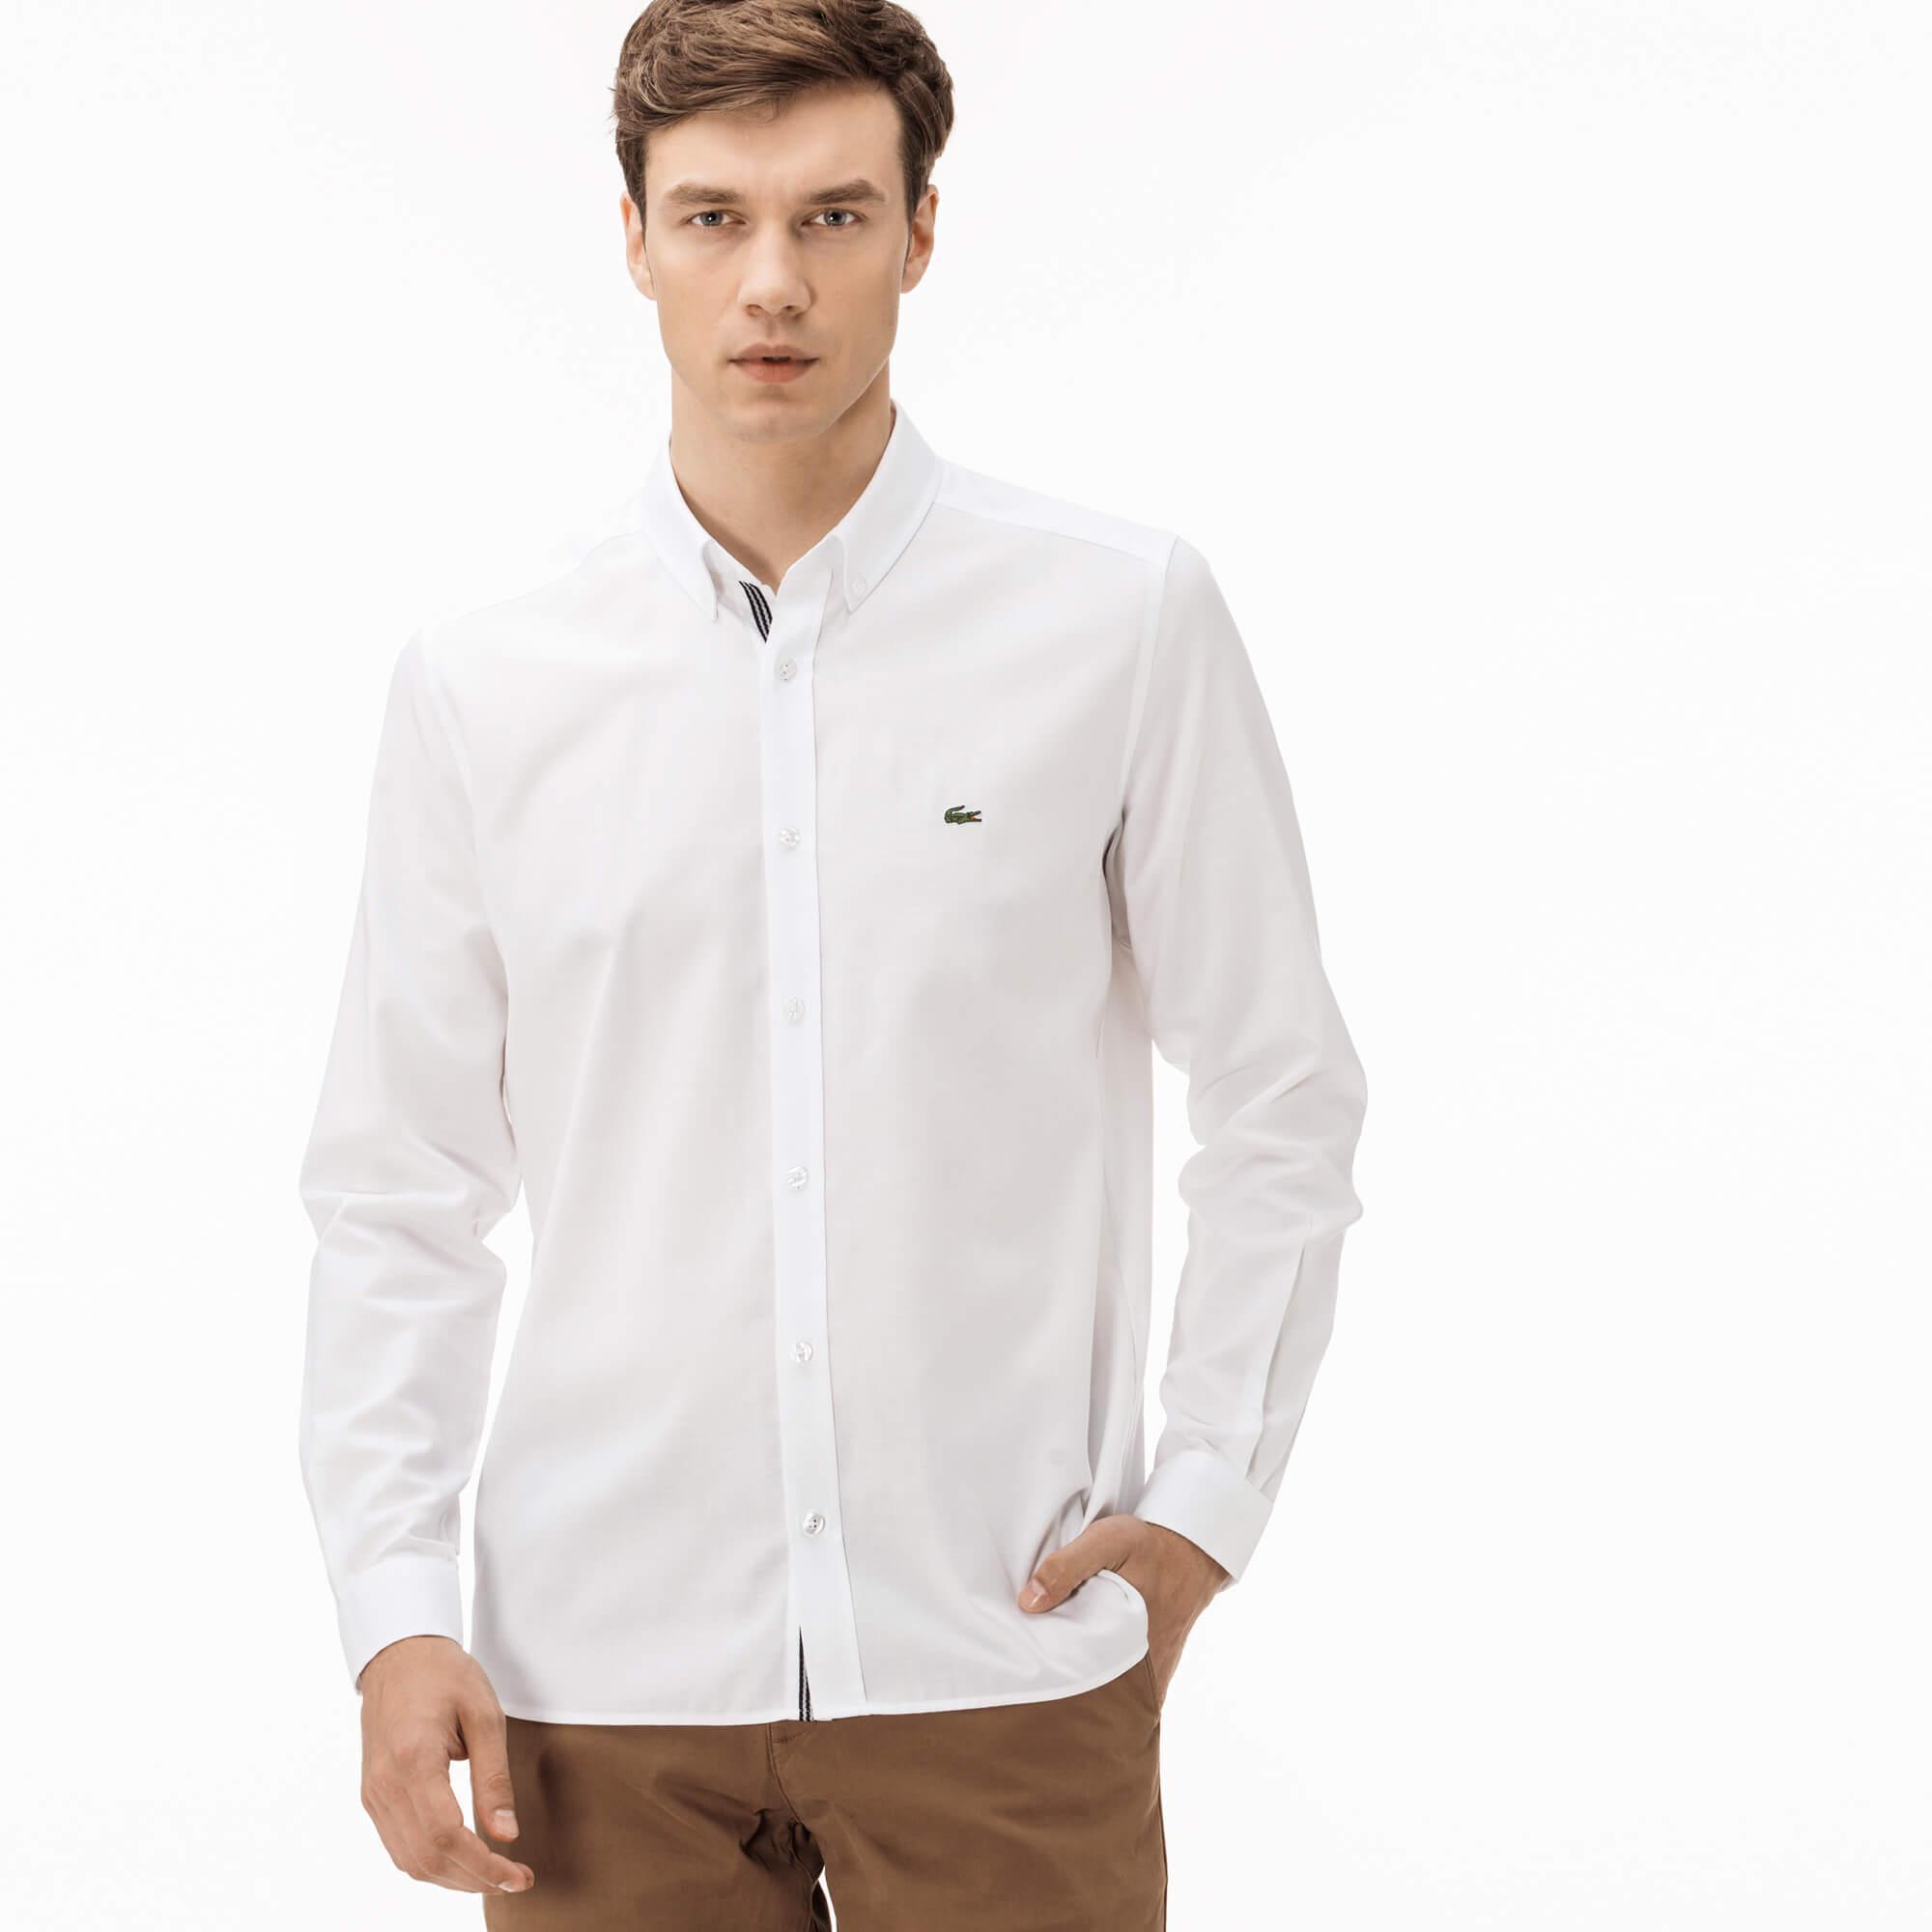 Lacoste Erkek Slim Fit Beyaz Oxford Gömlek